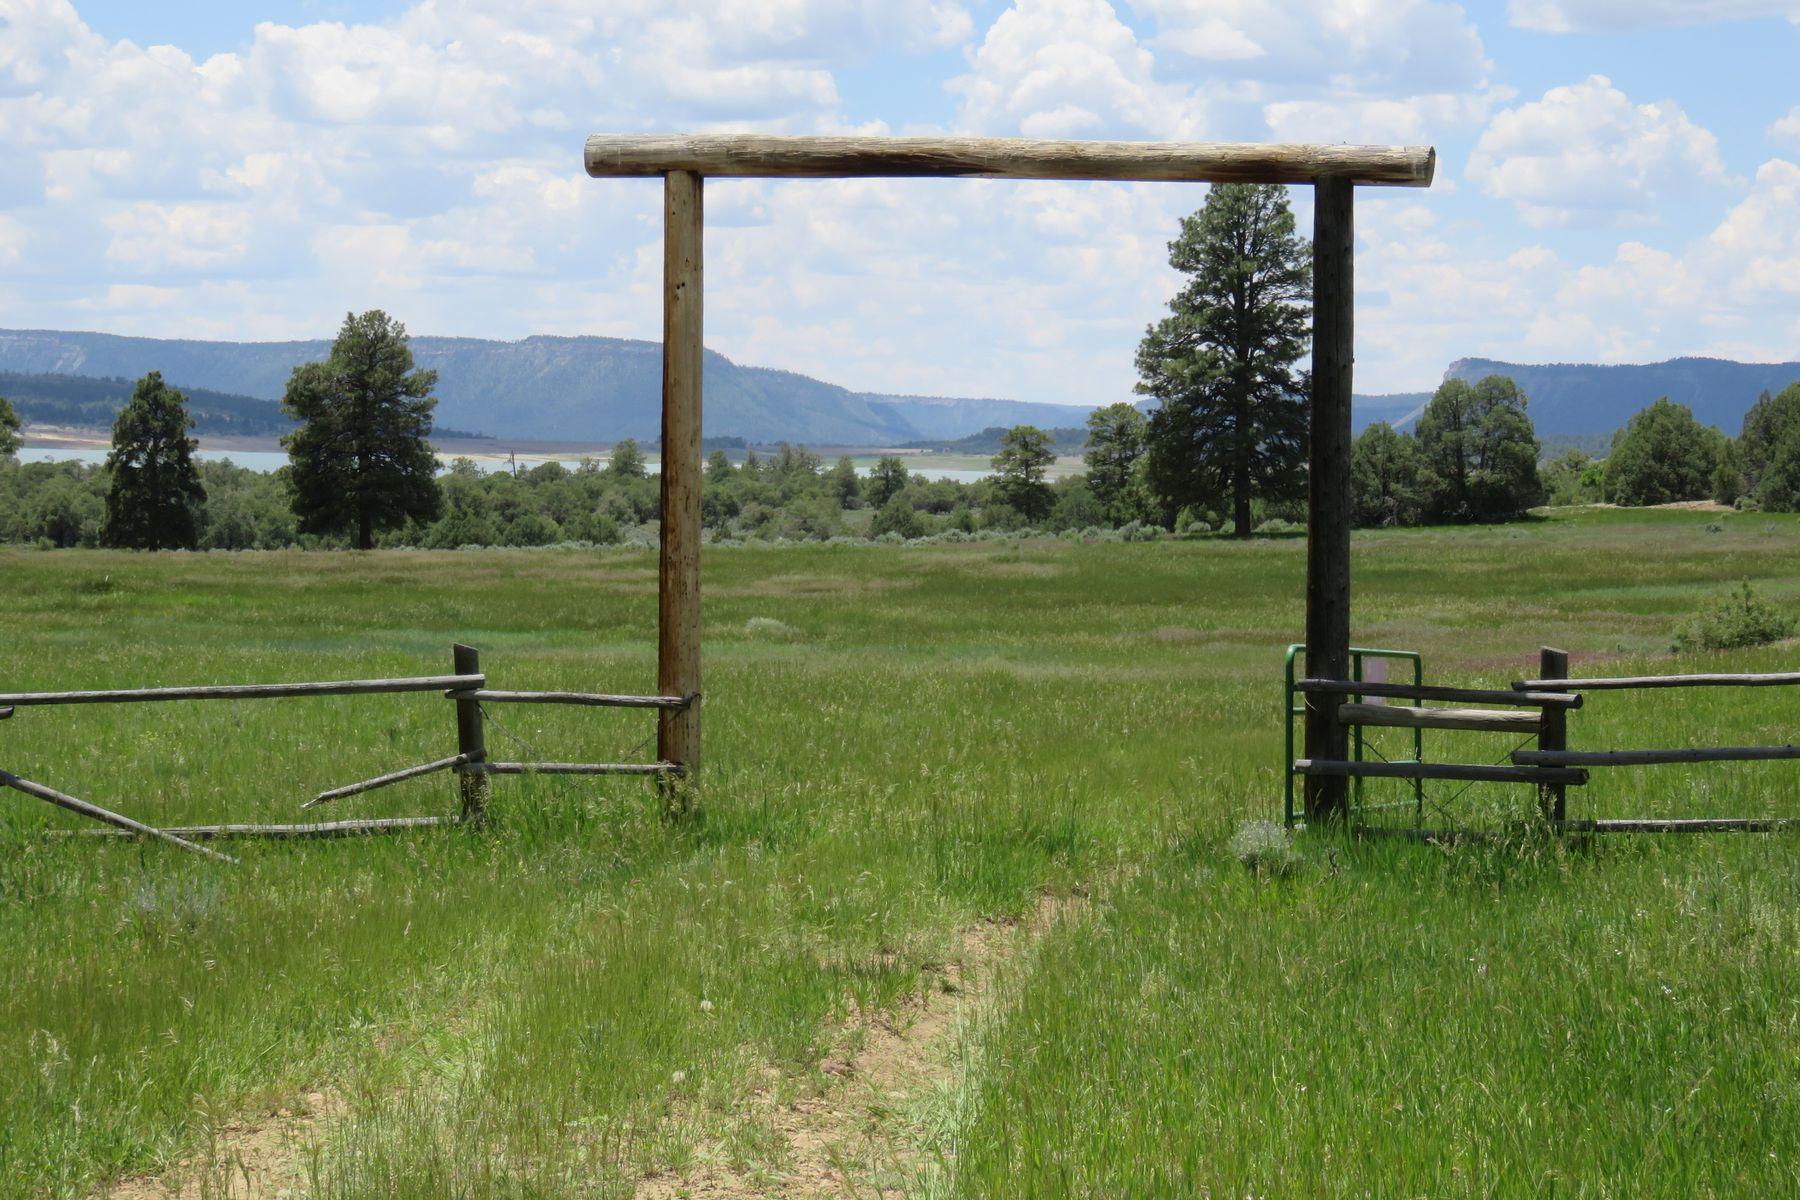 أراضي للـ Sale في Los Ojos, New Mexico 87551 United States